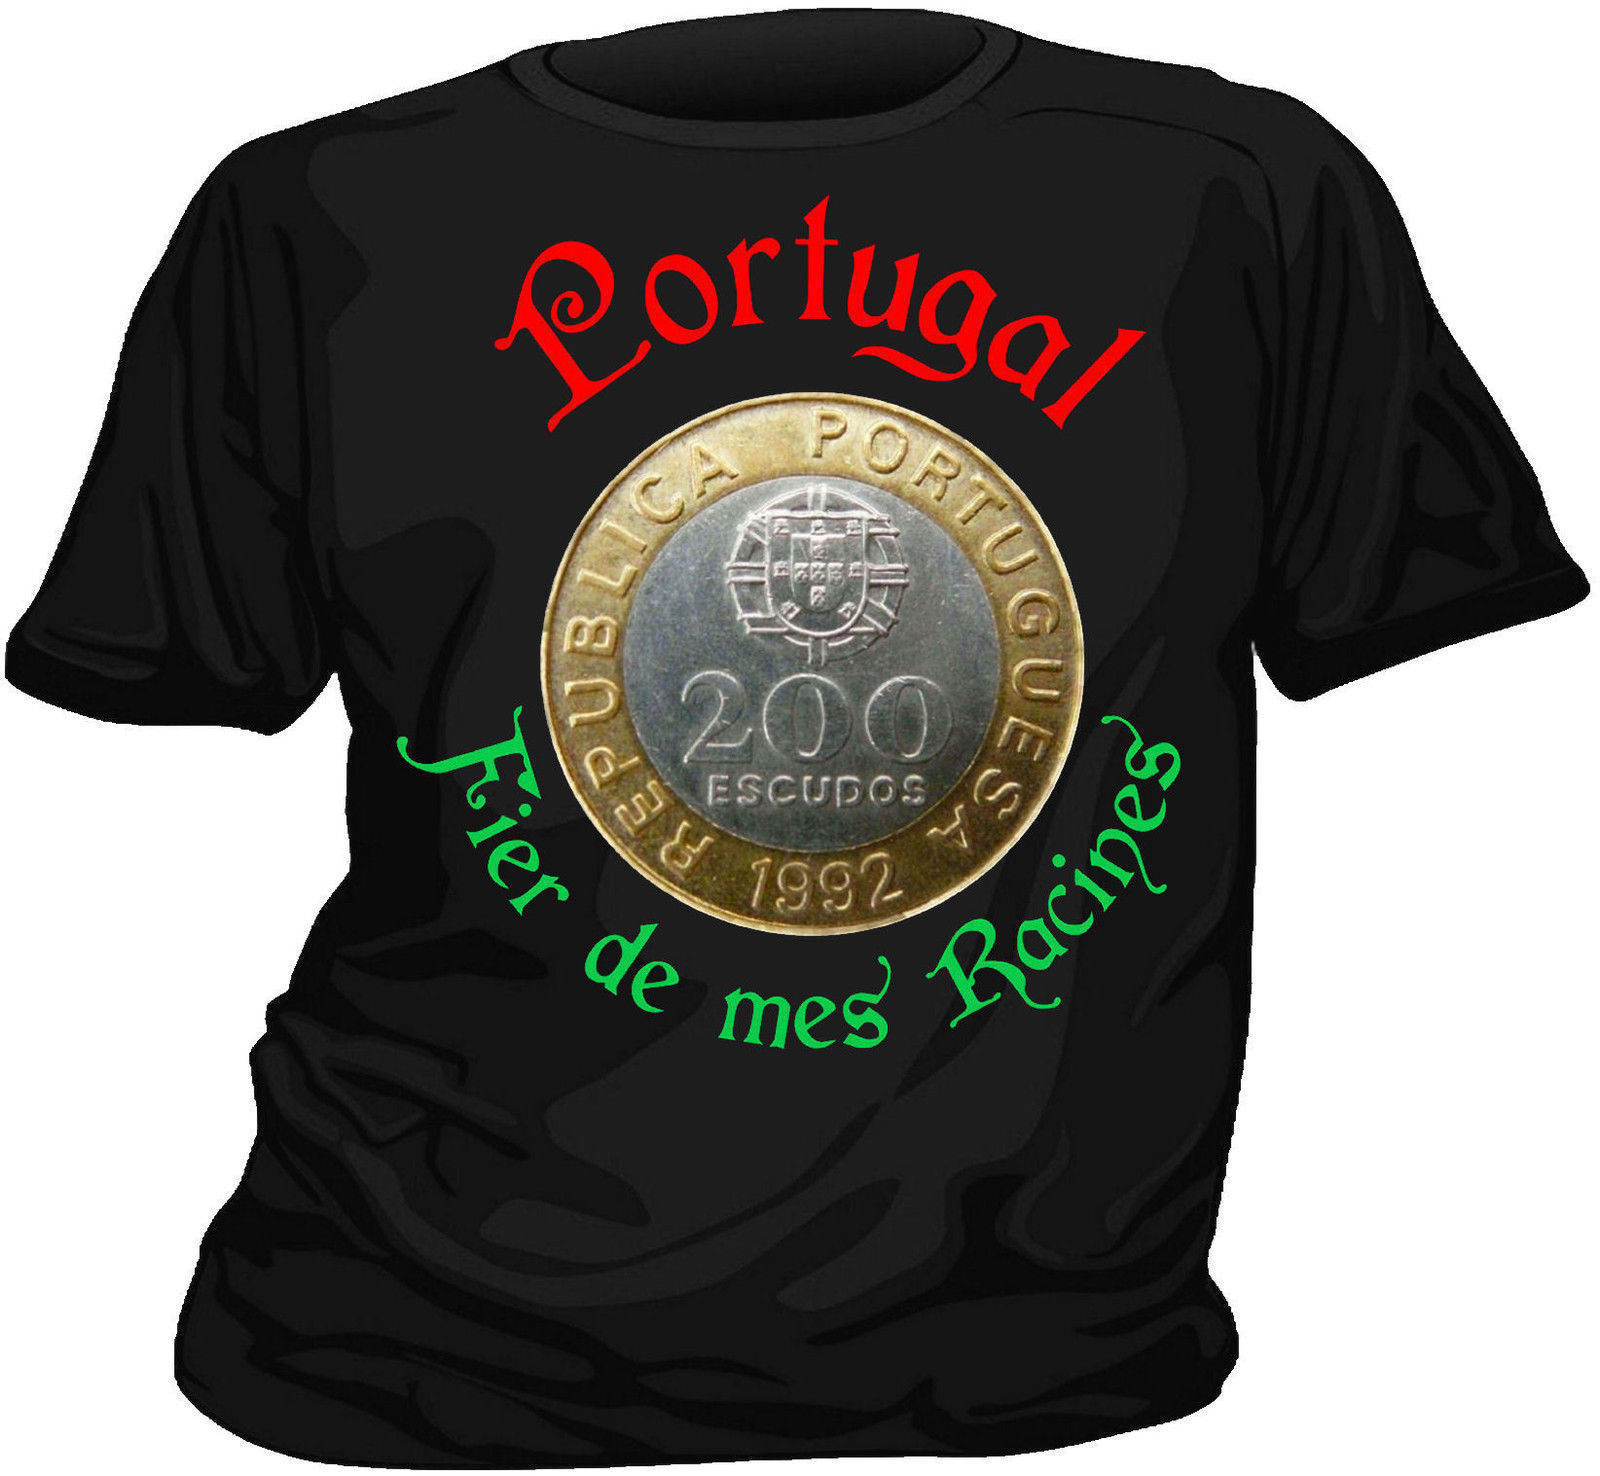 2018 fashion solid color men tshirt tee shirt portugal. Black Bedroom Furniture Sets. Home Design Ideas